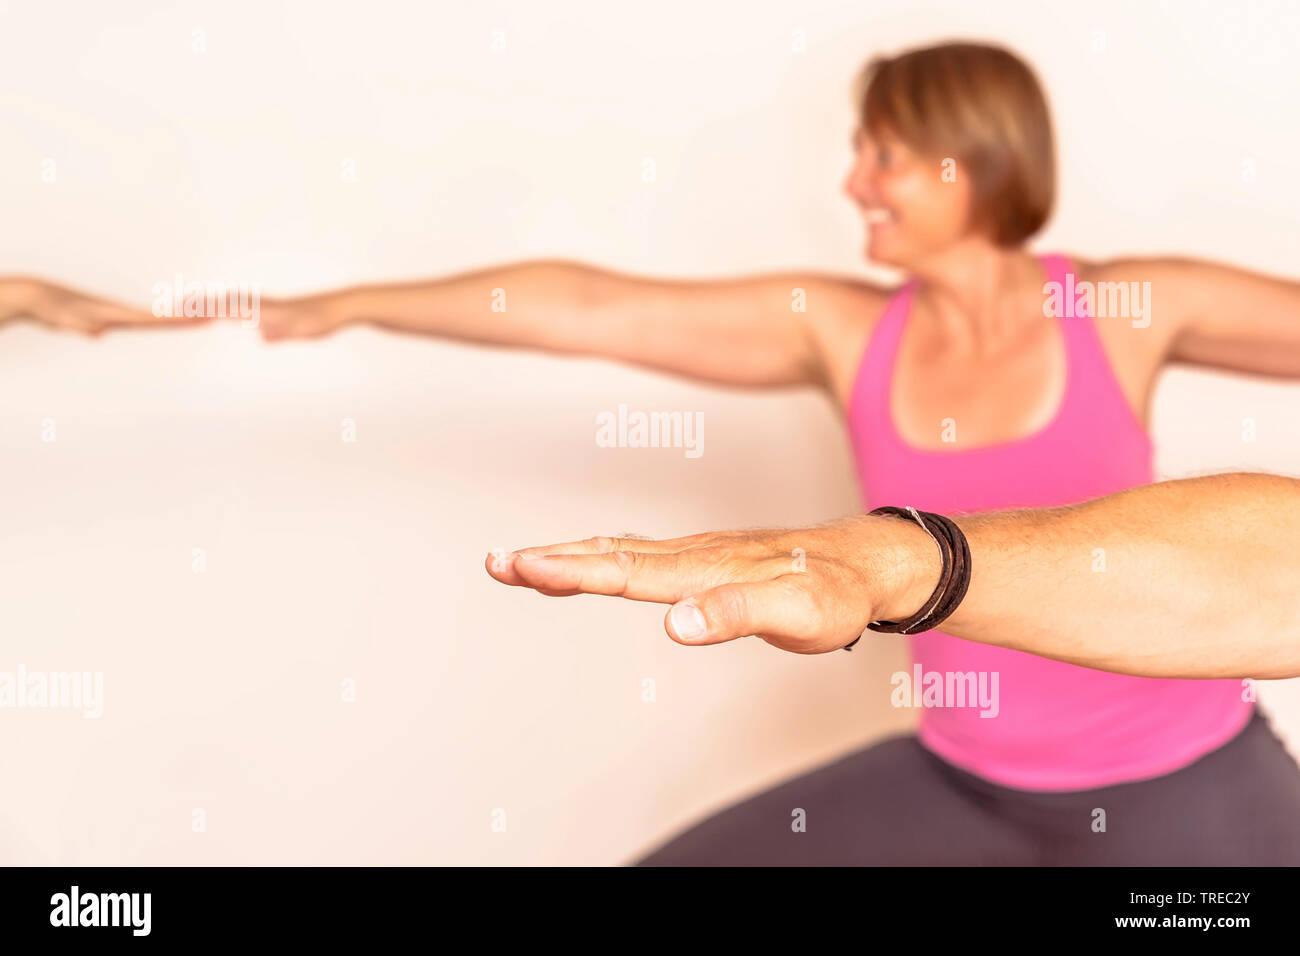 Frau und Mann machen Yoga-Uebungen, Europa | woman and man doing yoga, Europe | BLWS522579.jpg [ (c) blickwinkel/McPHOTO/M. Gann Tel. +49 (0)2302-2793 - Stock Image